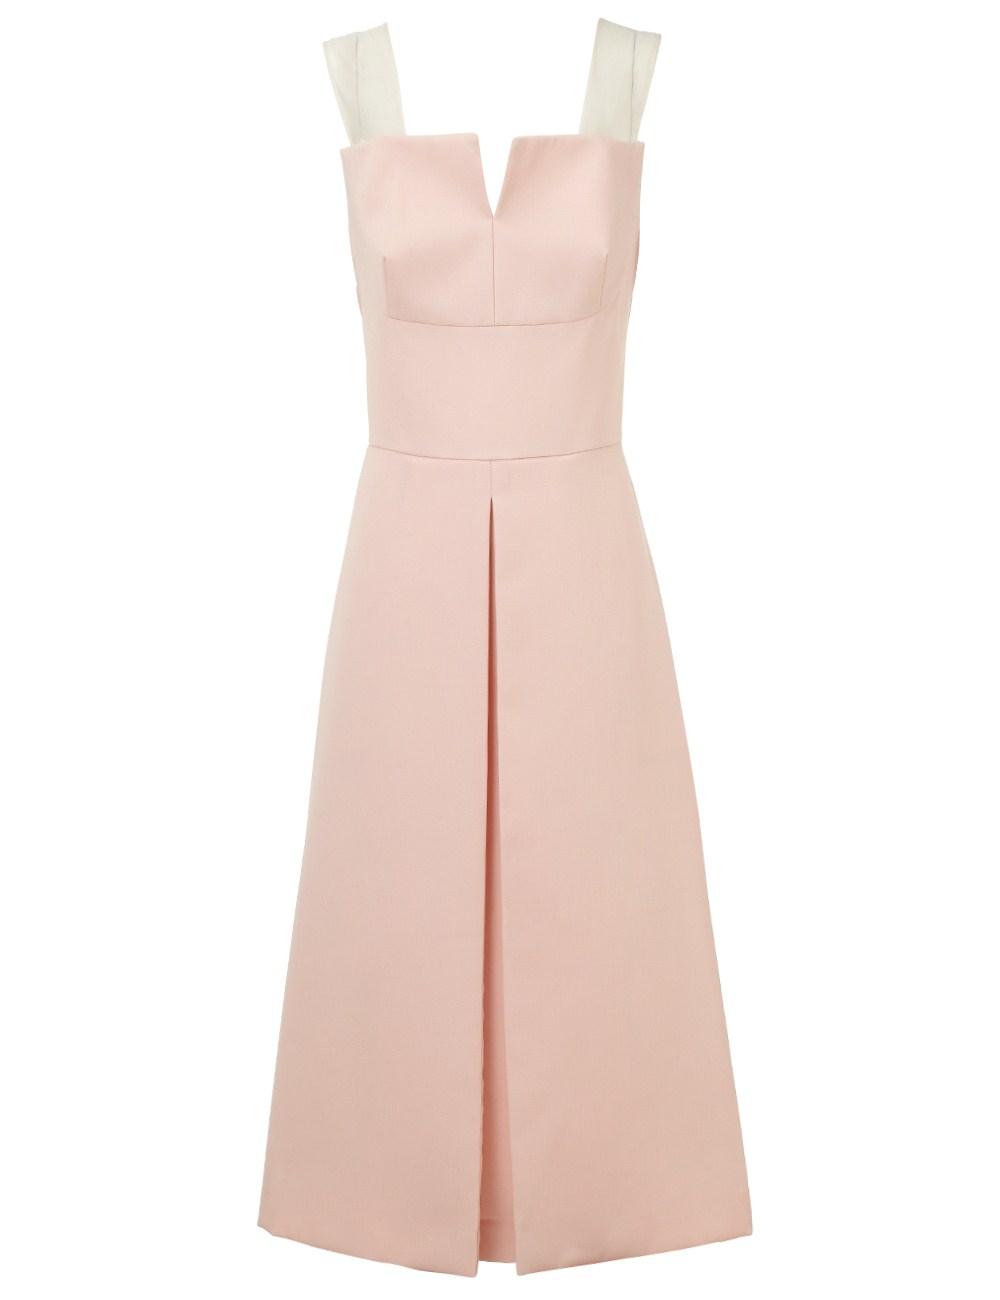 3.1 phillip lim Powder Pink Wool Martini Dress in Pink - Lyst